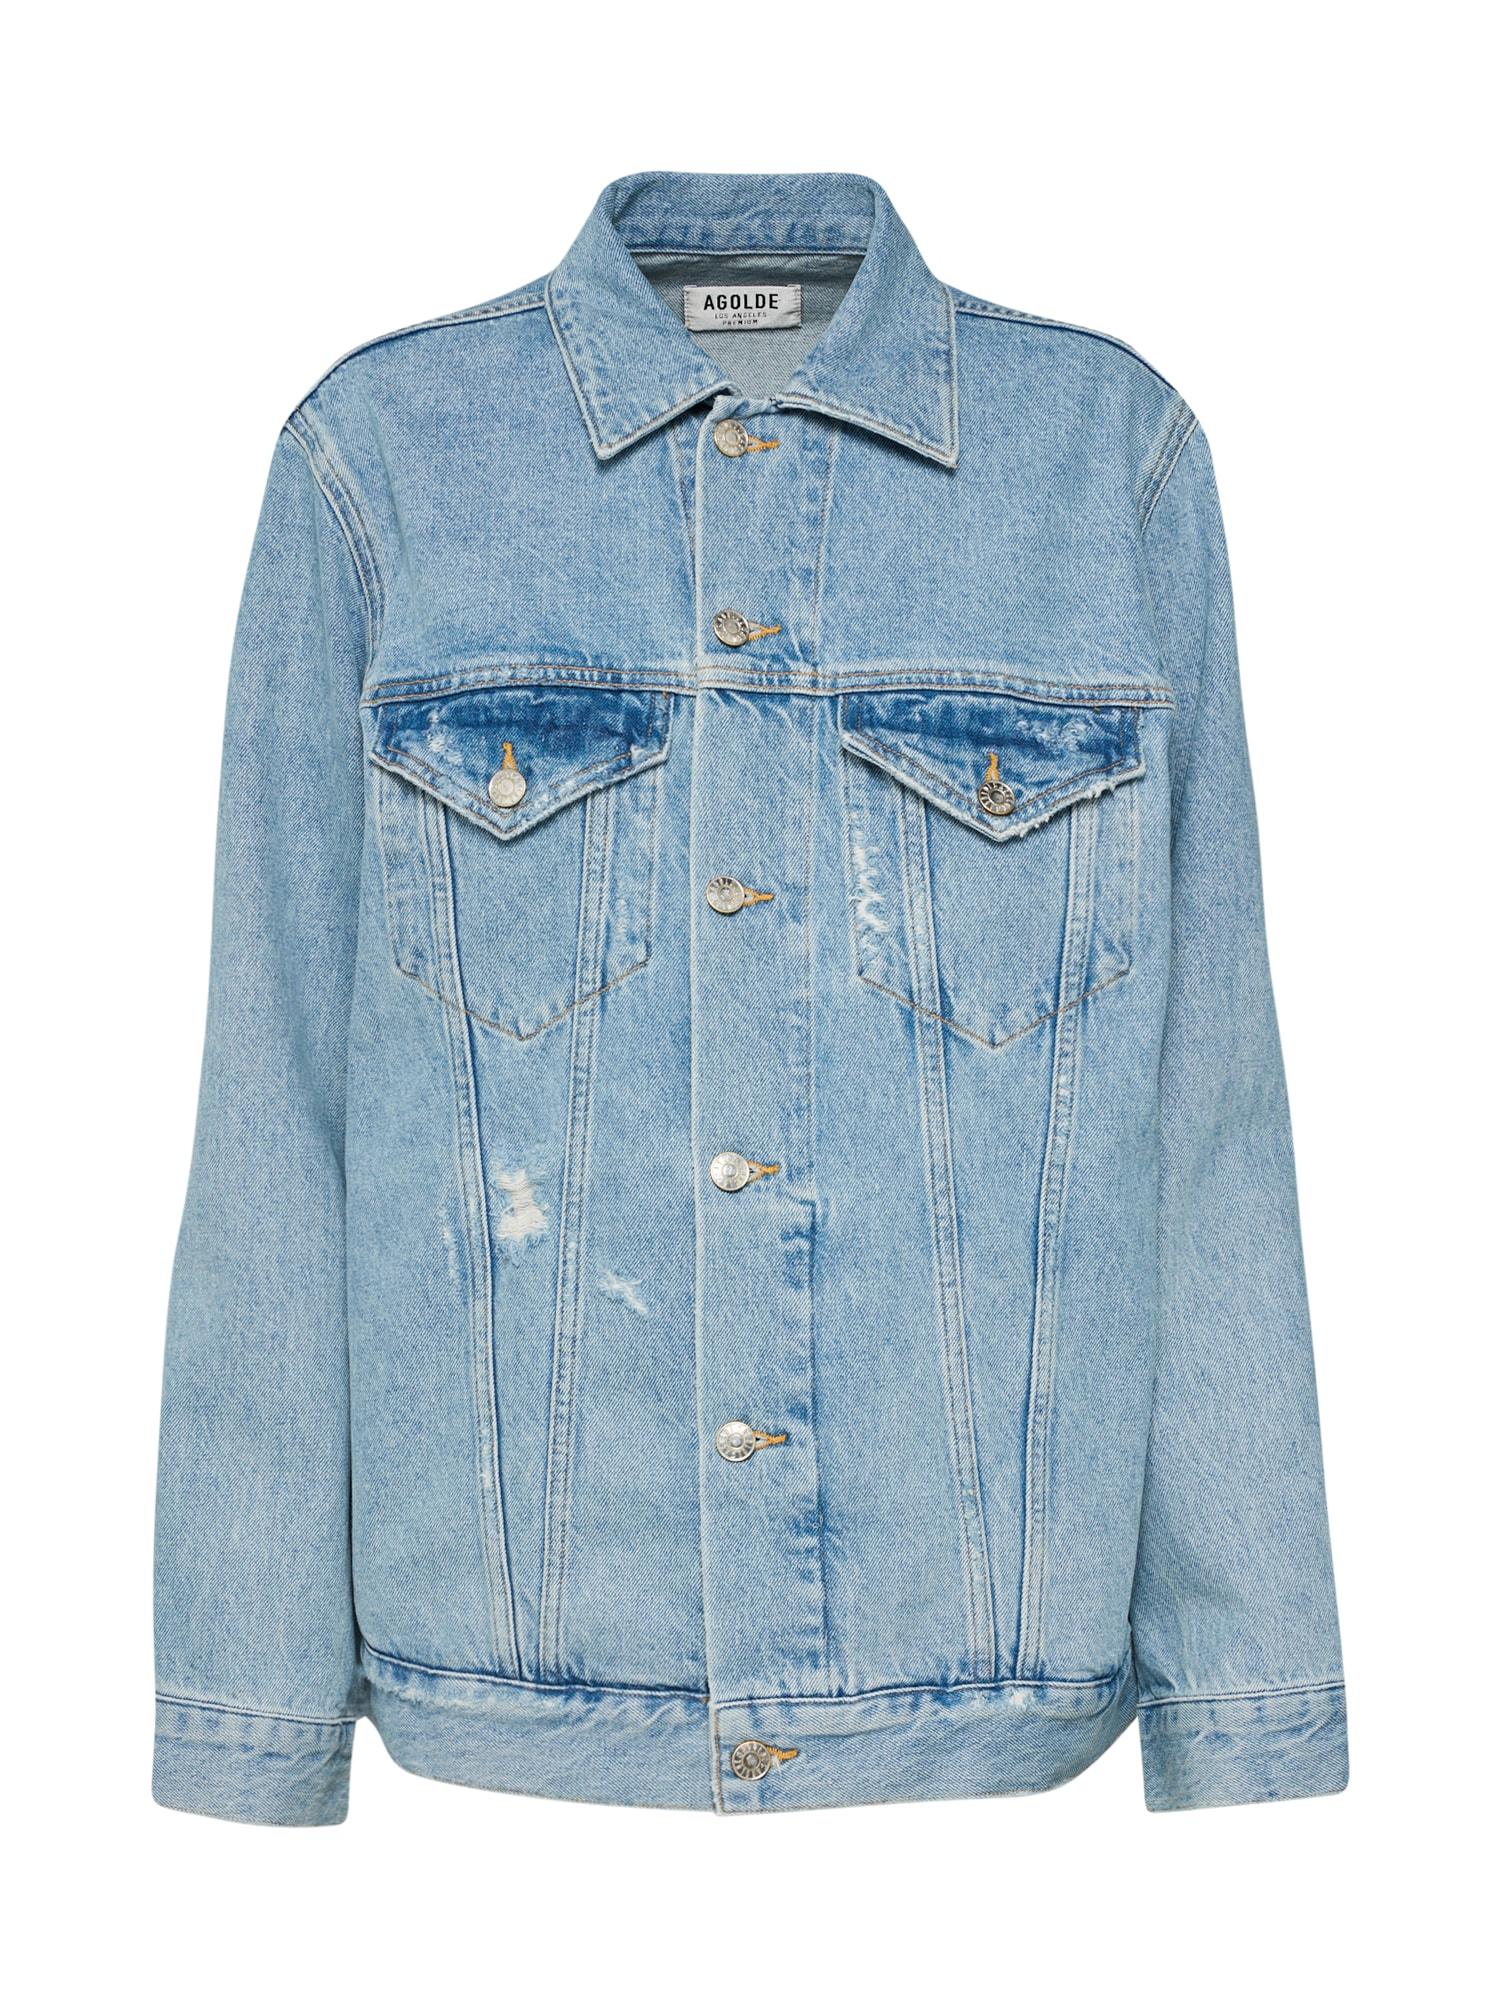 AGOLDE, Dames Tussenjas 'Jessie Oversized 90's', blauw